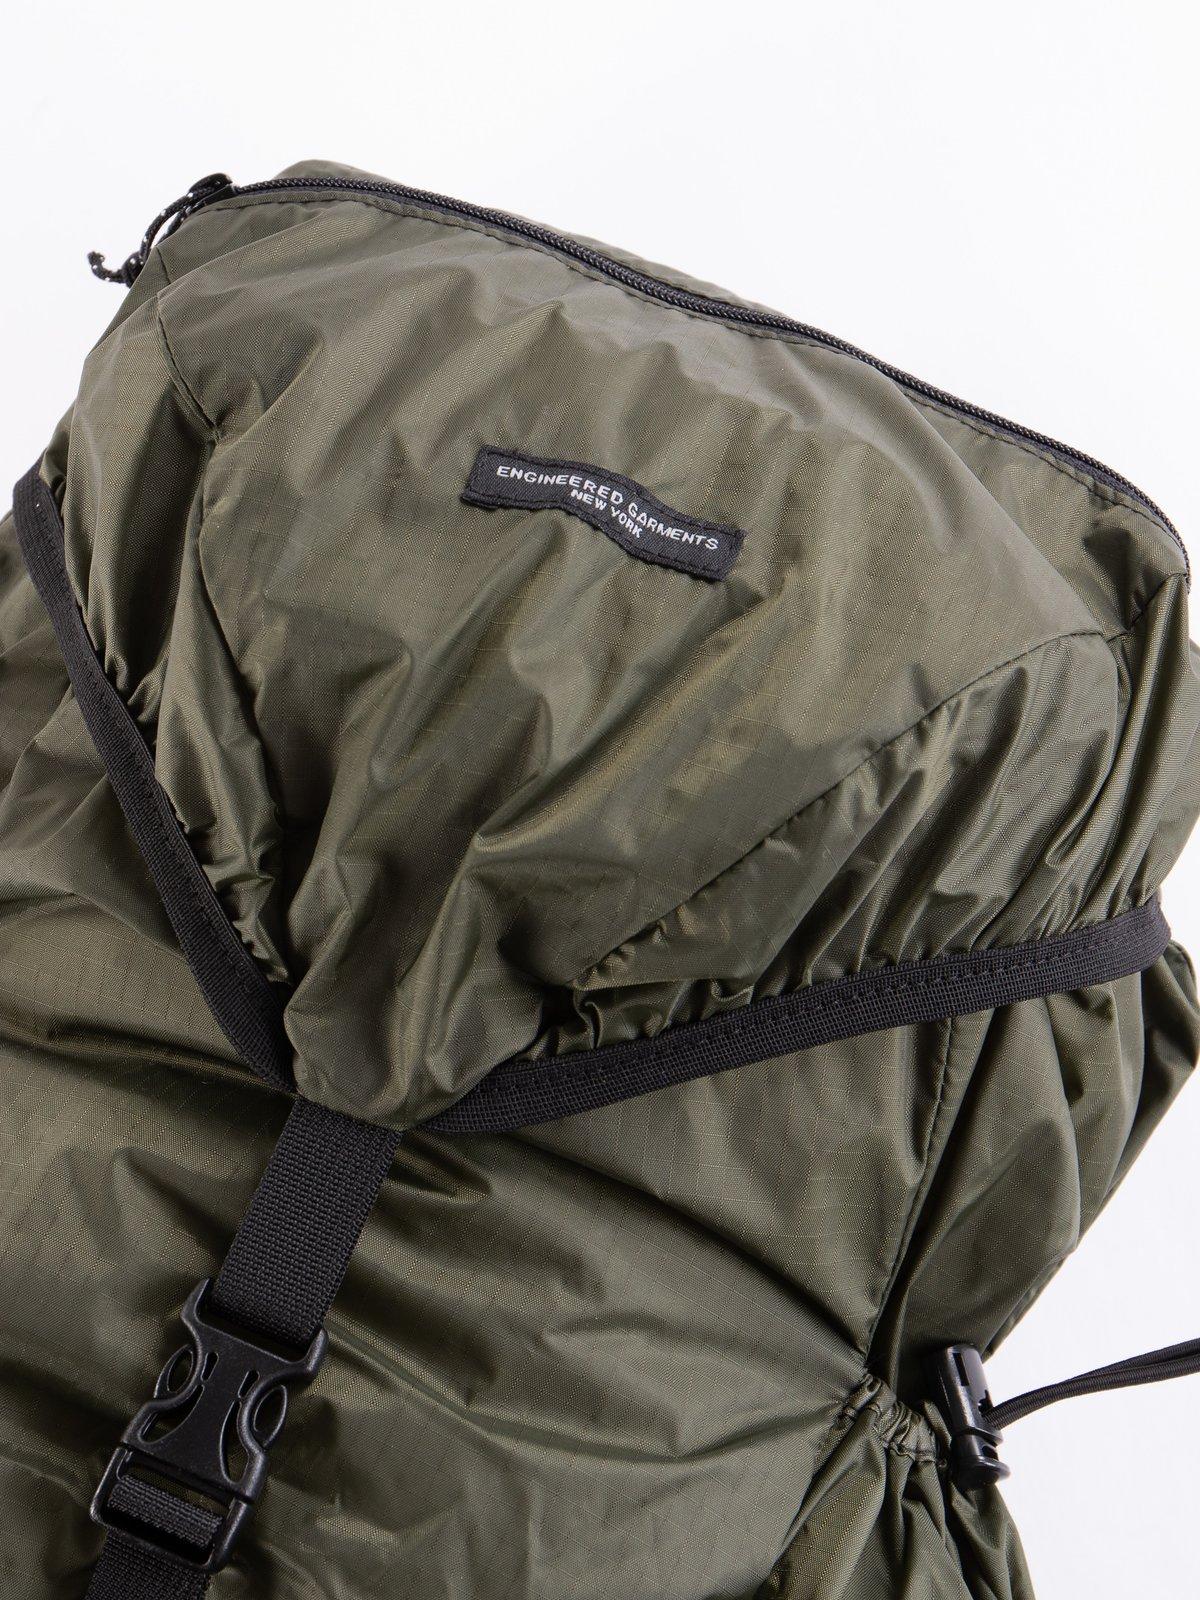 Olive Nylon Ripstop UL Backpack - Image 2